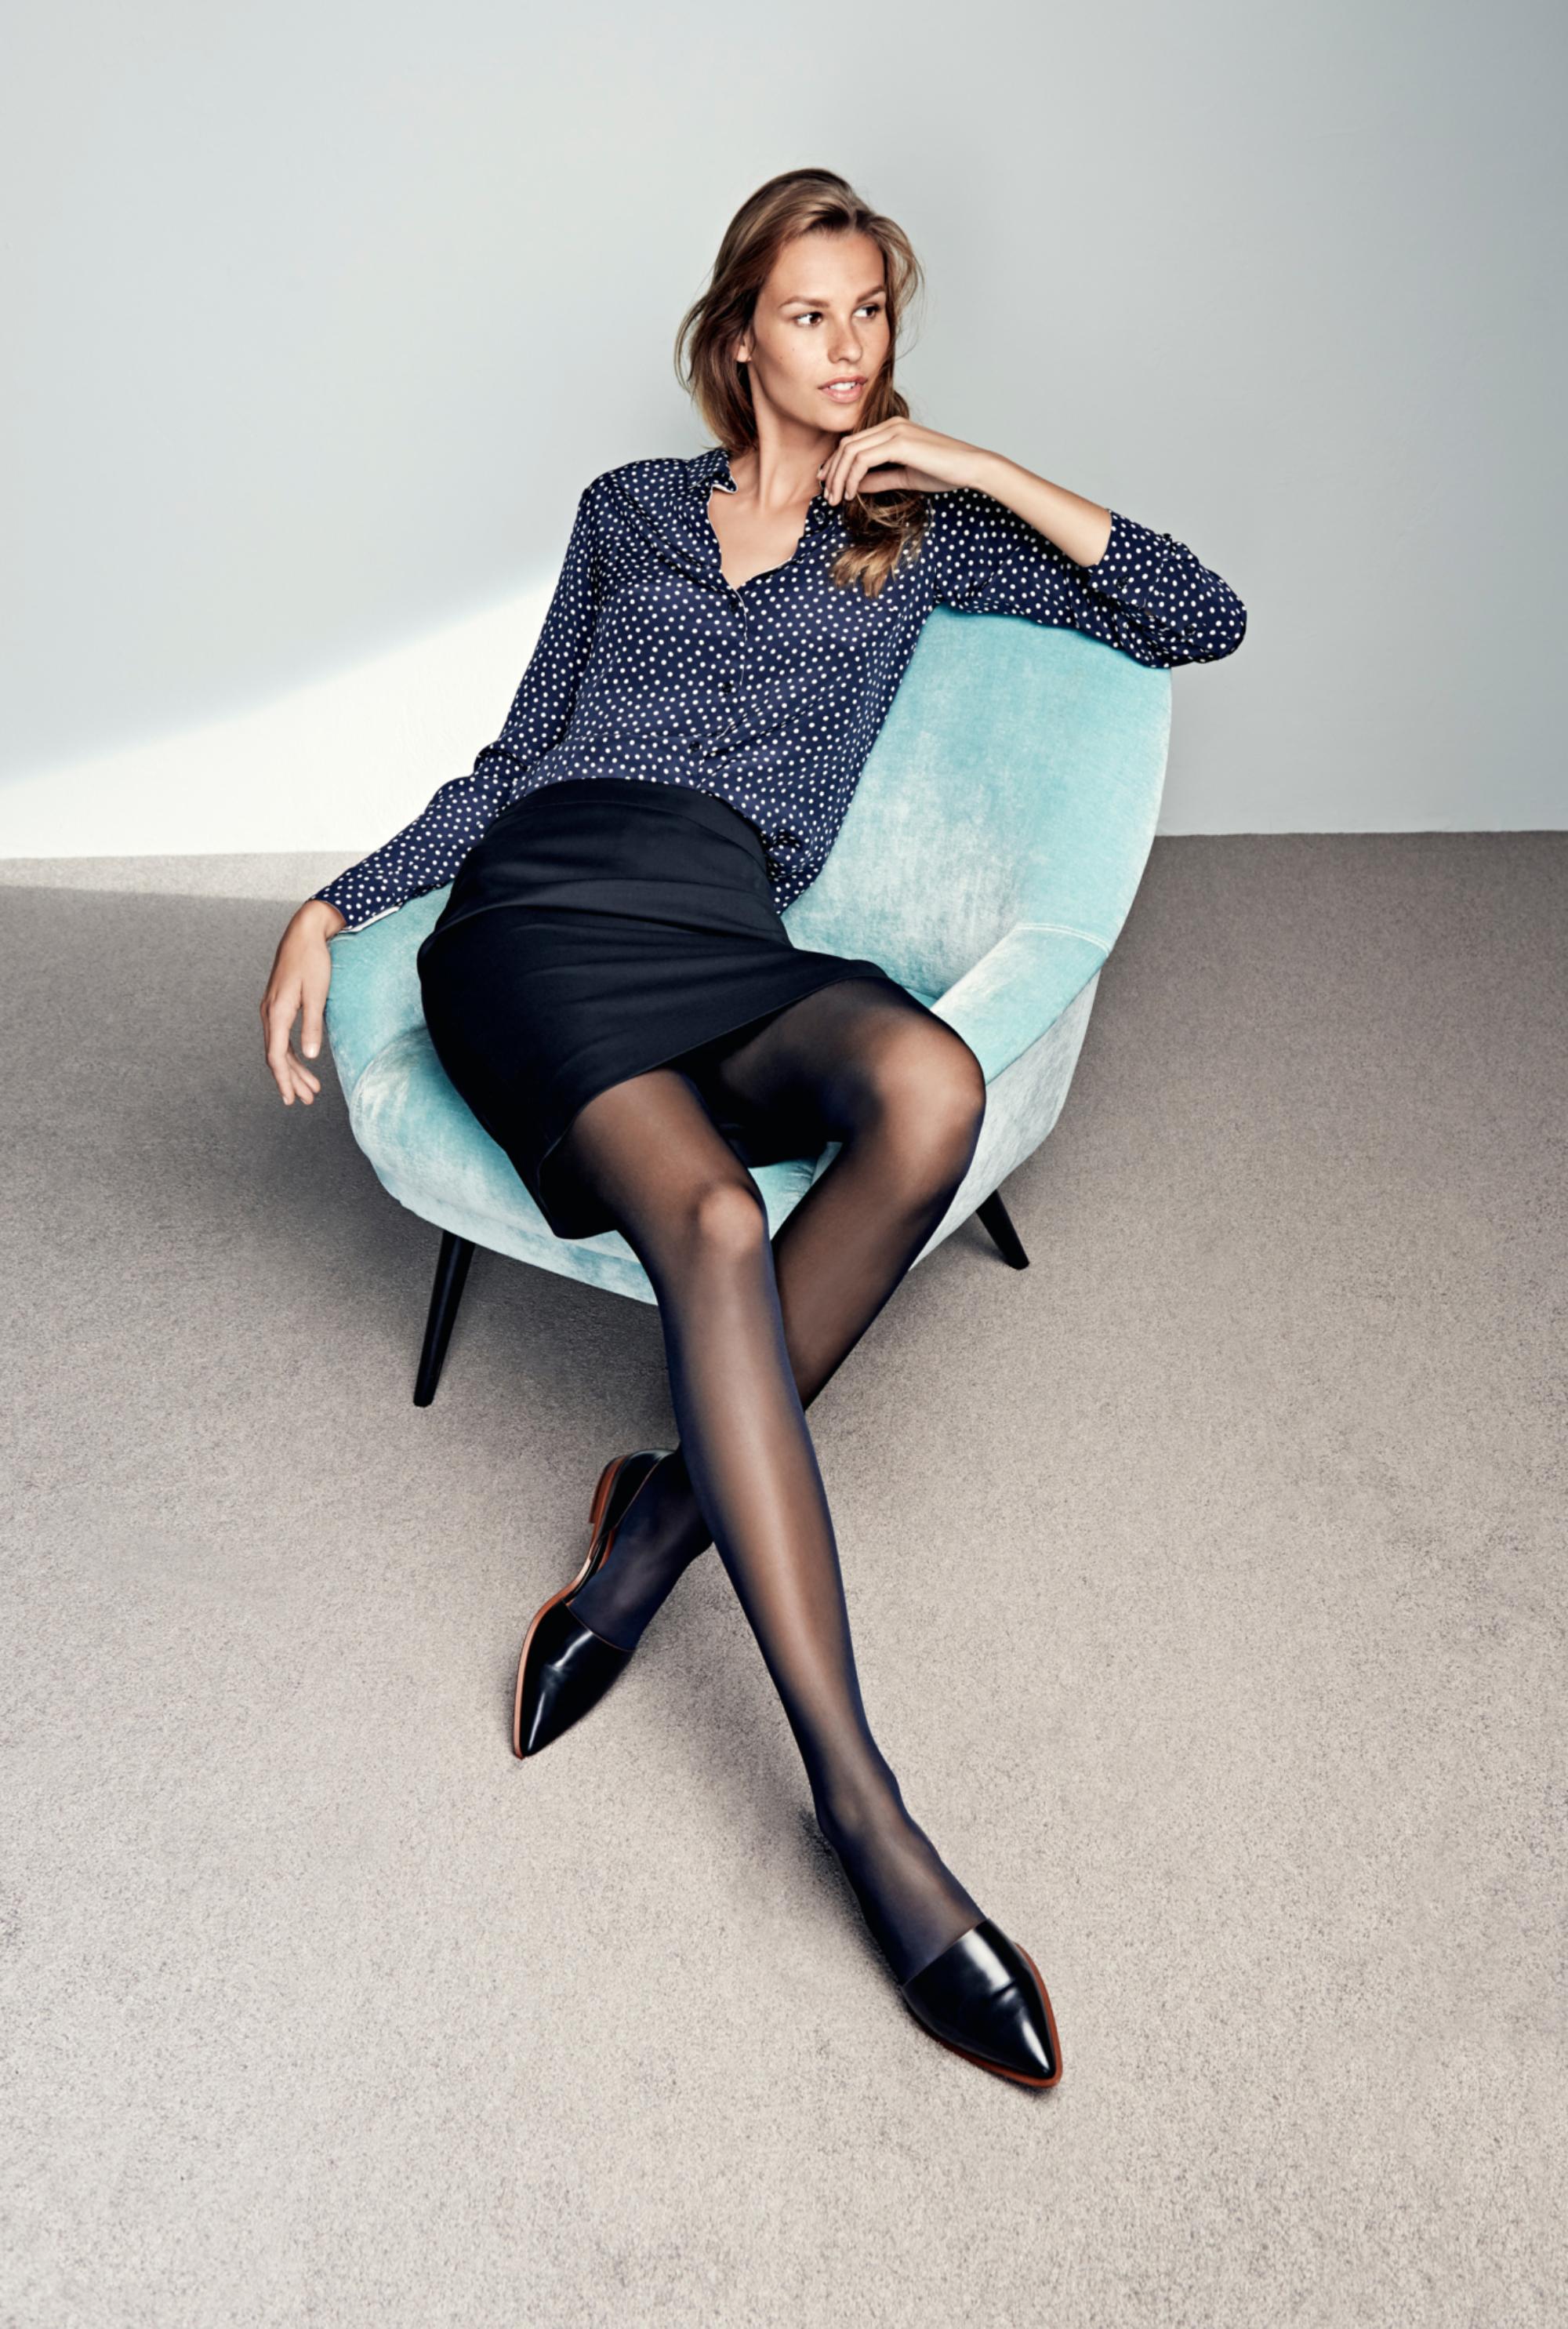 Vogue Agency Leroy